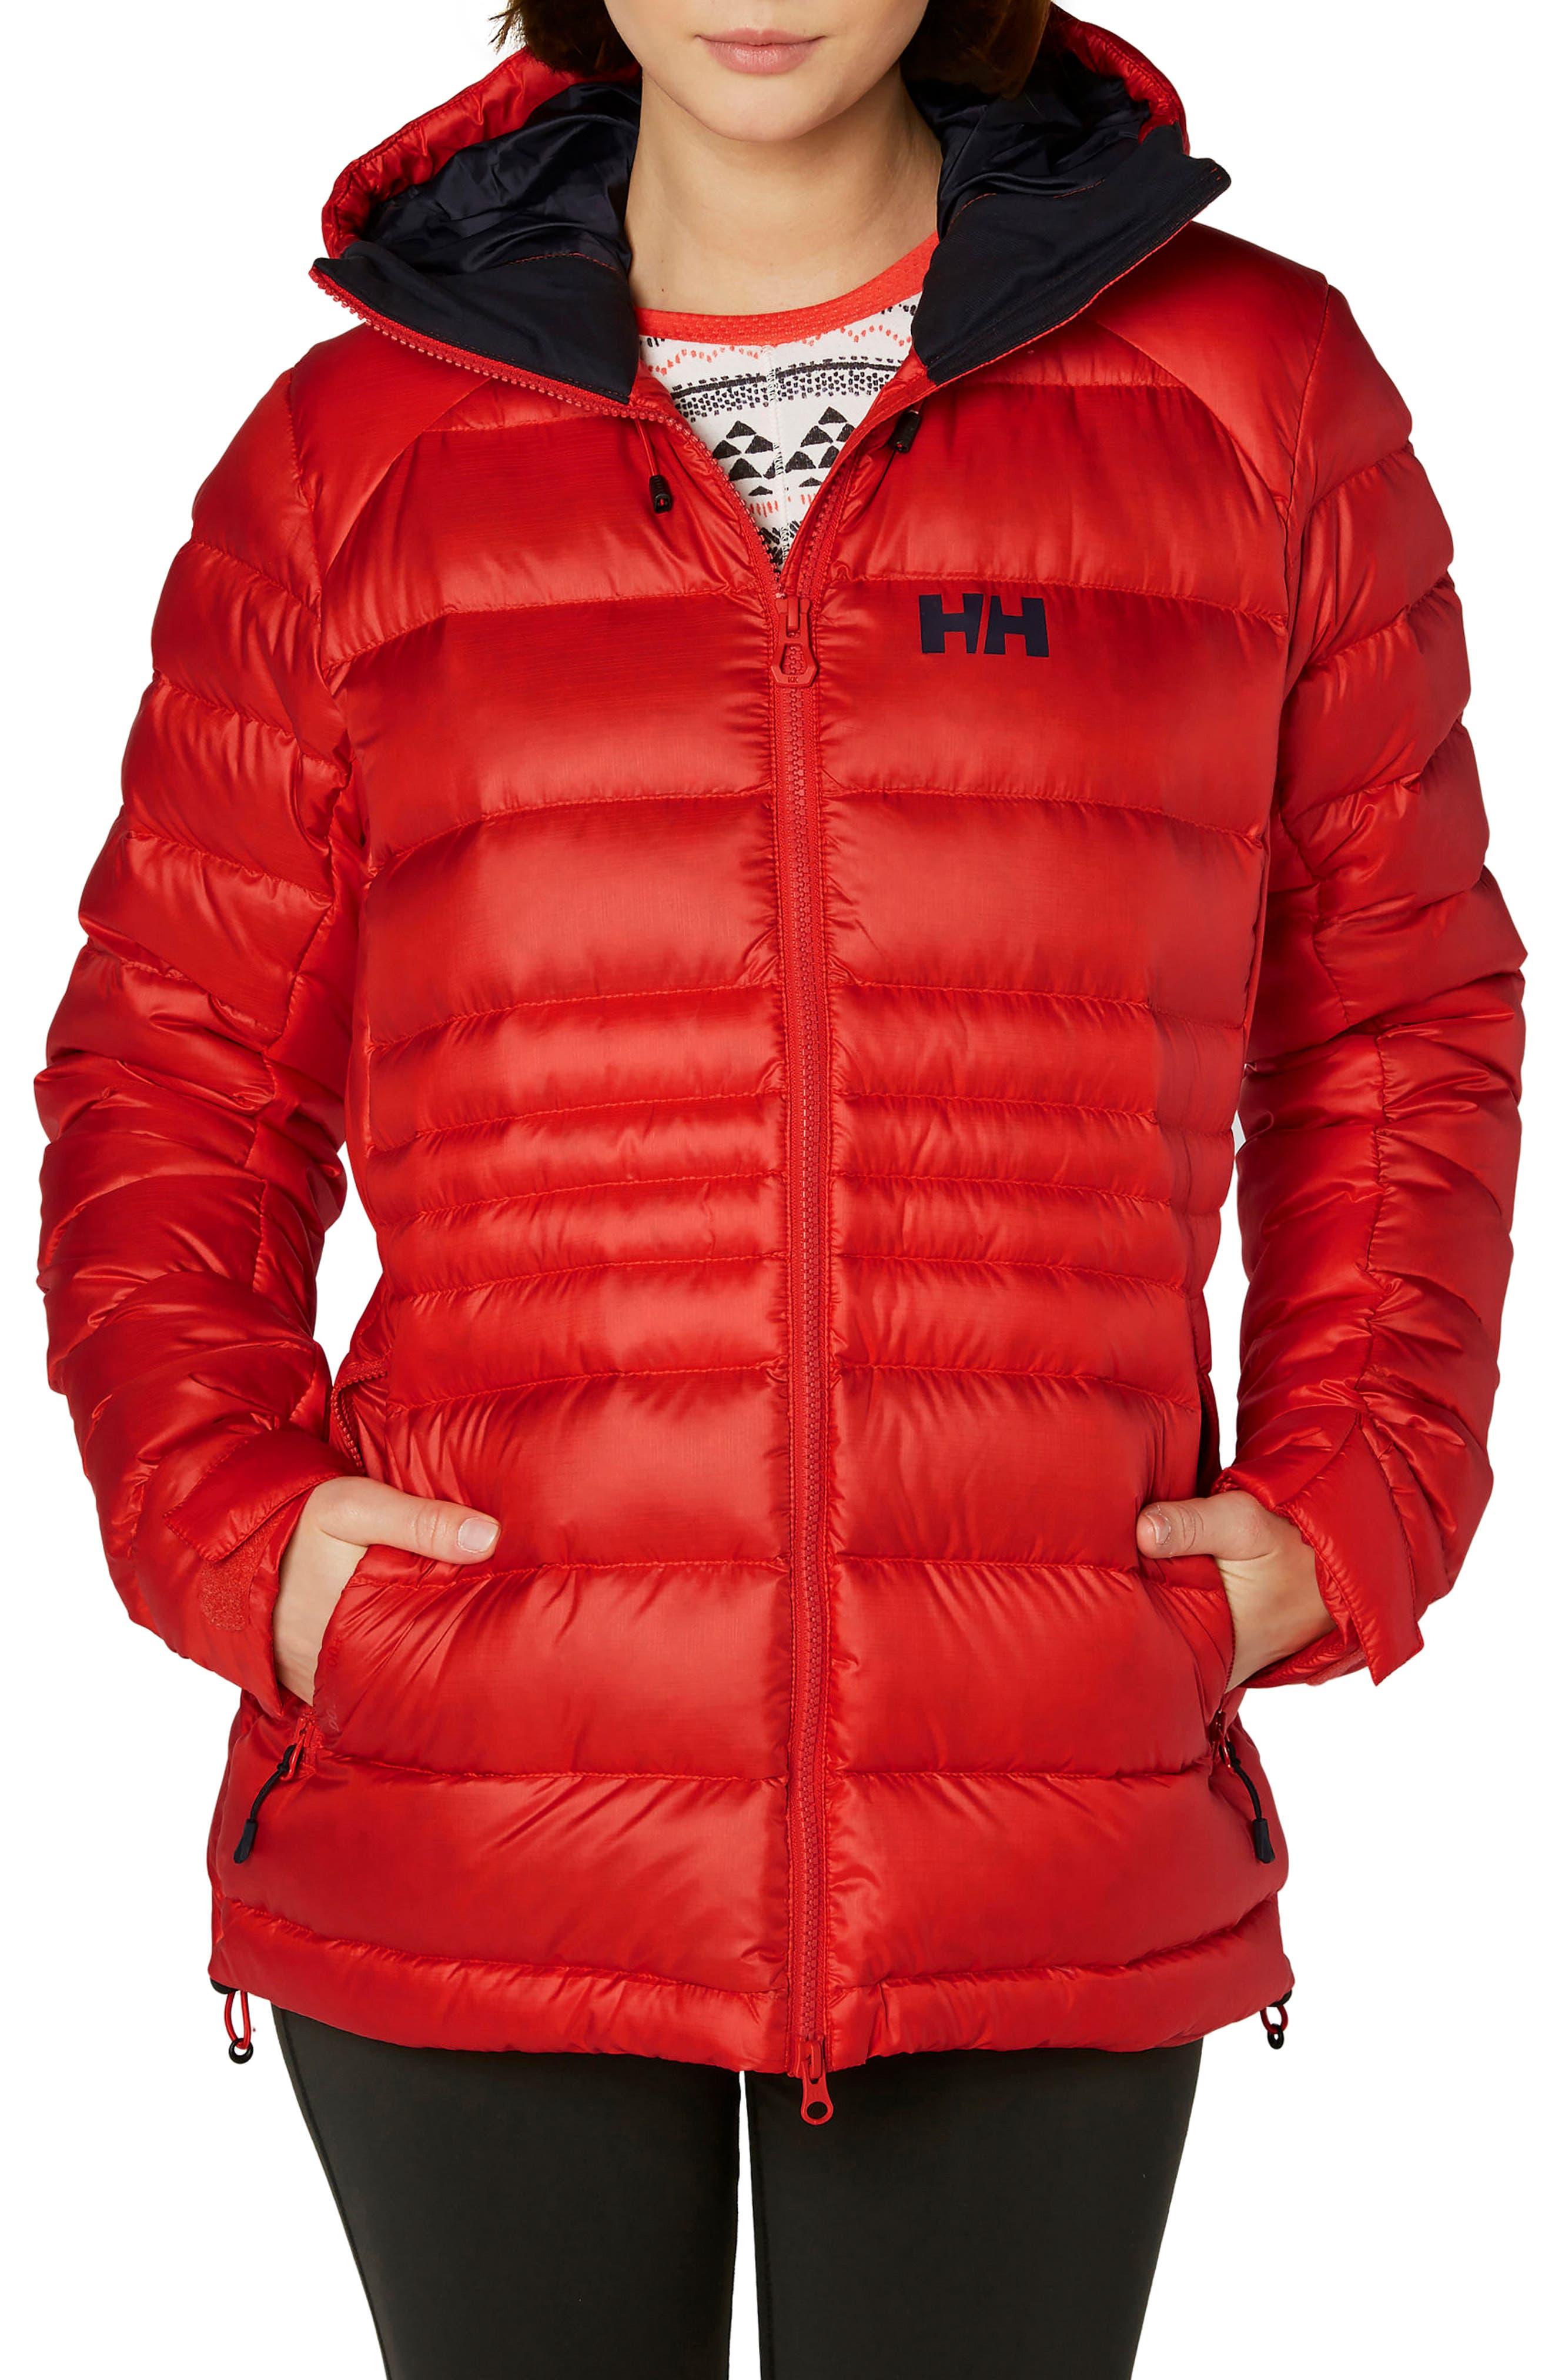 Vanir Icefall Down Jacket,                         Main,                         color, 106 Melt Down